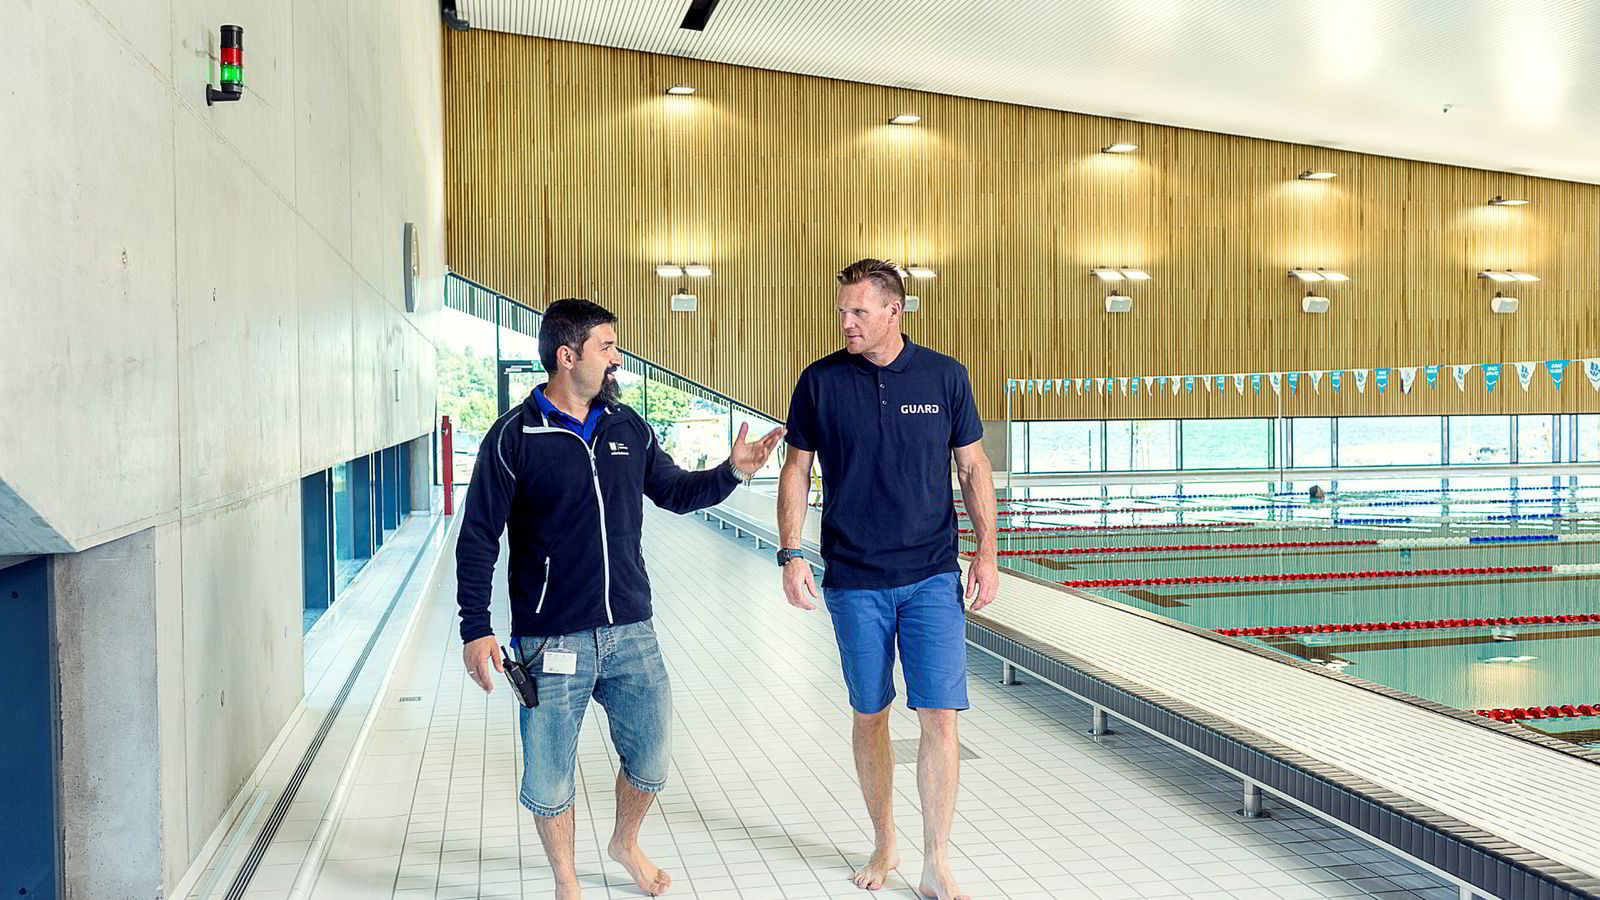 Styrer svømmehallen via en smartklokke